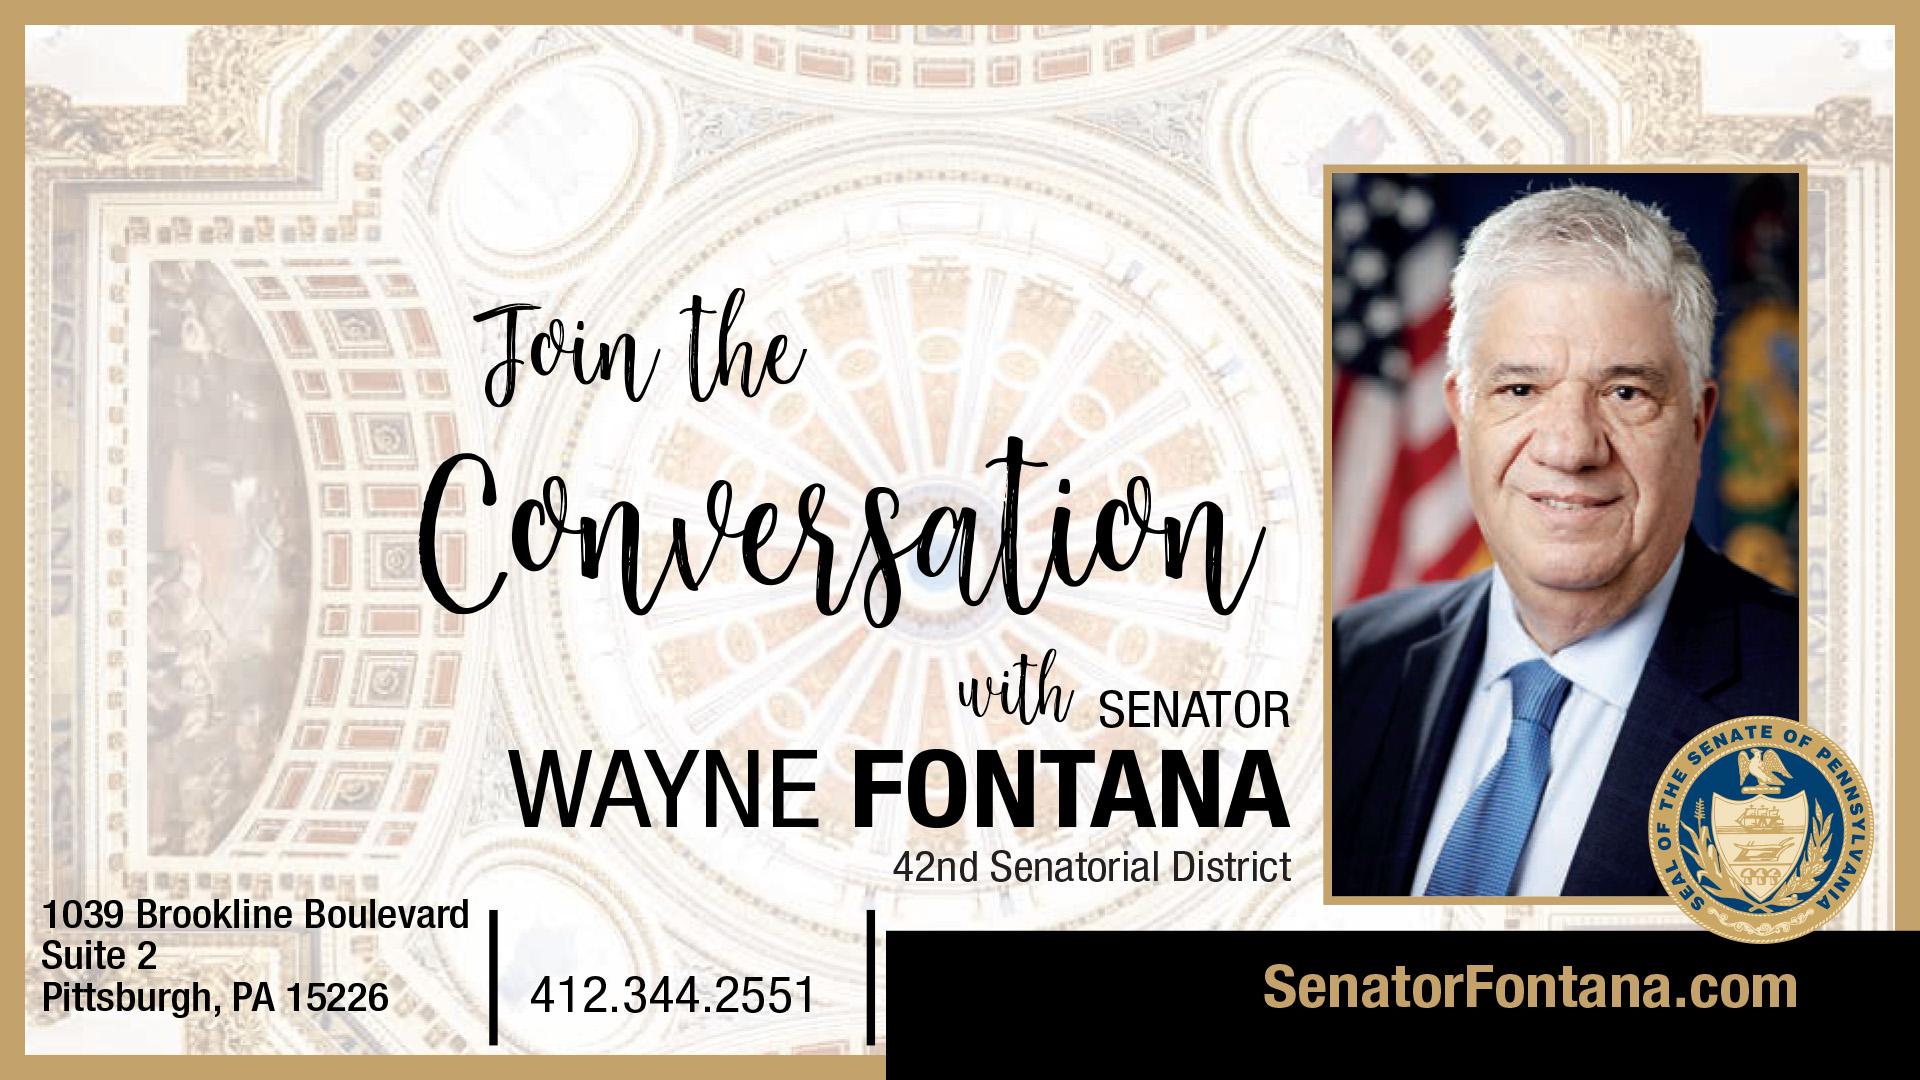 PA State Senator Wayne Fontana